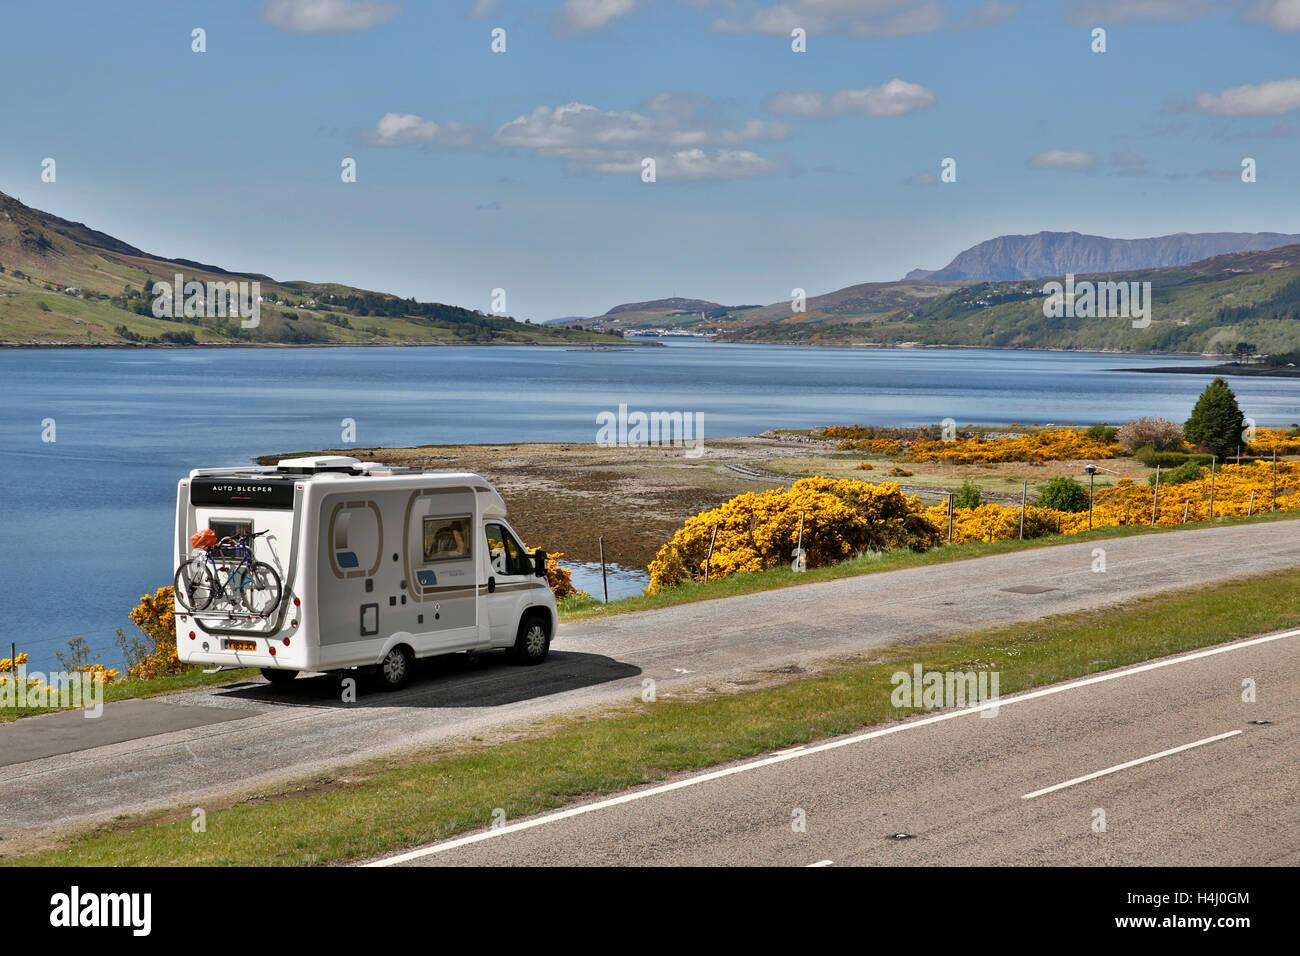 Loch Broom; Lookig Towards Ullapool; Motorhome Parked; Gorse in Flower; Scotland; UK - Stock Image